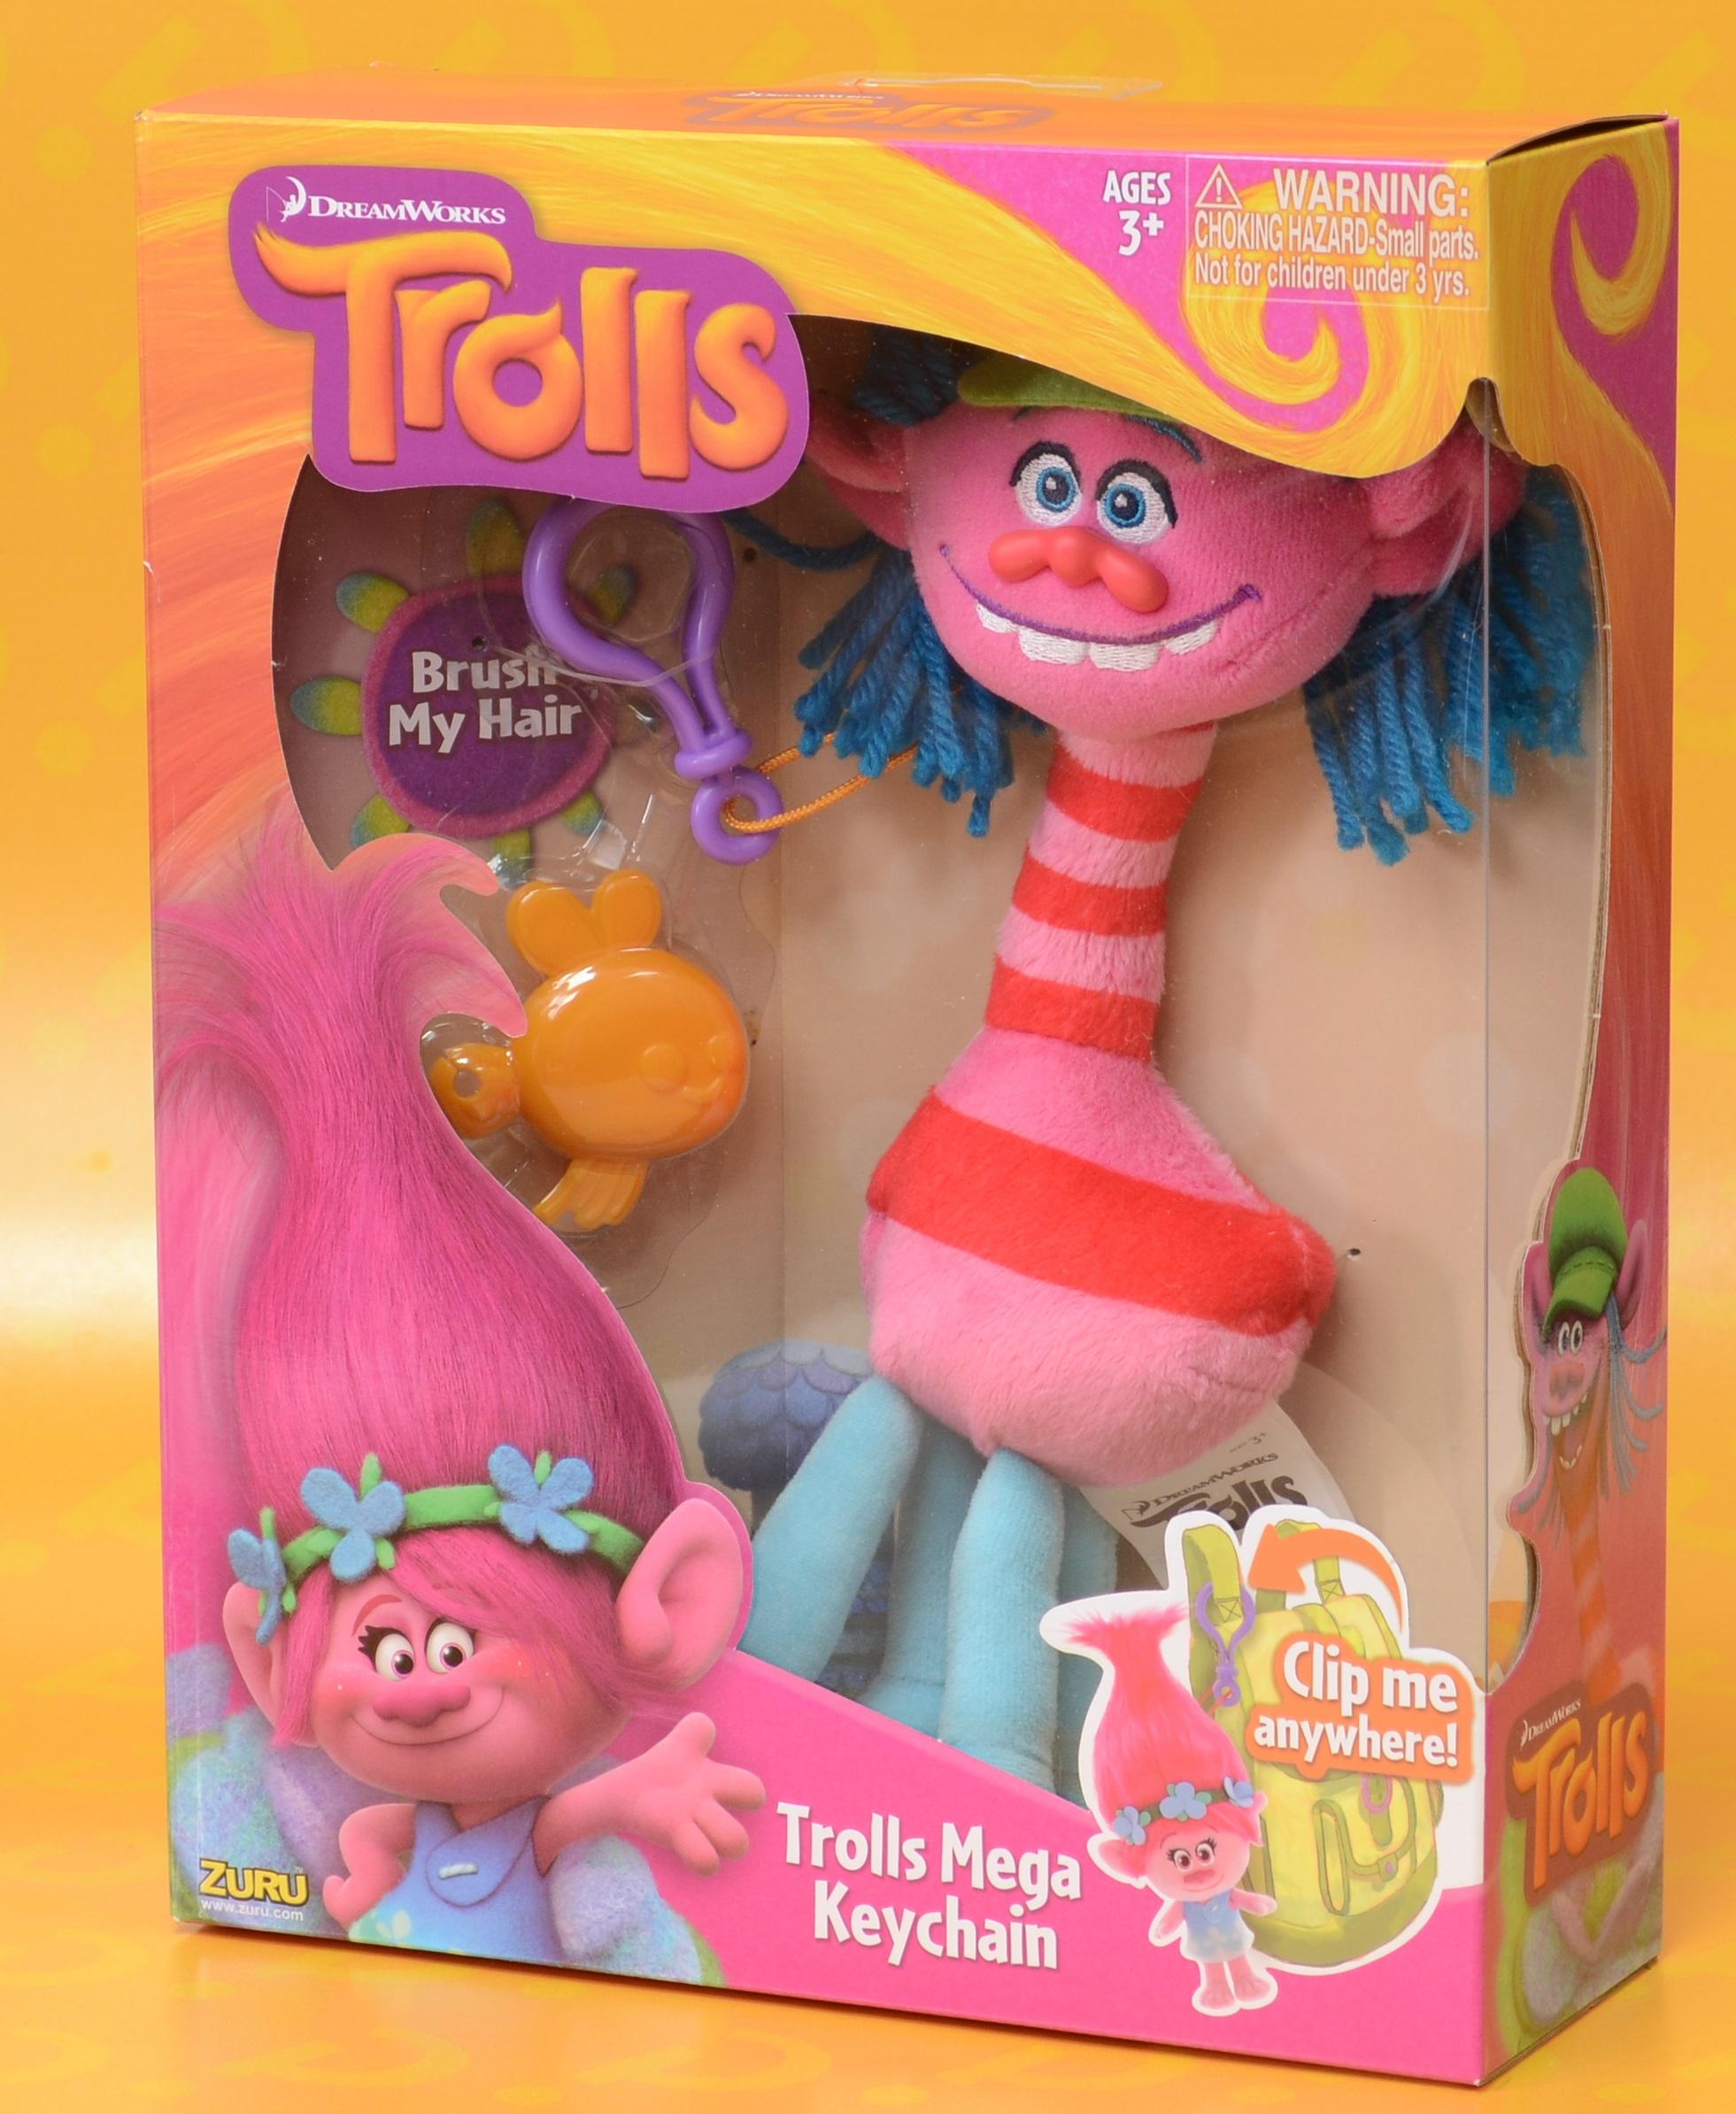 Мягкая игрушка Trolls. Тролль Купер (Cooper) мягкая игрушка trolls тролль пушистик fuzzbert